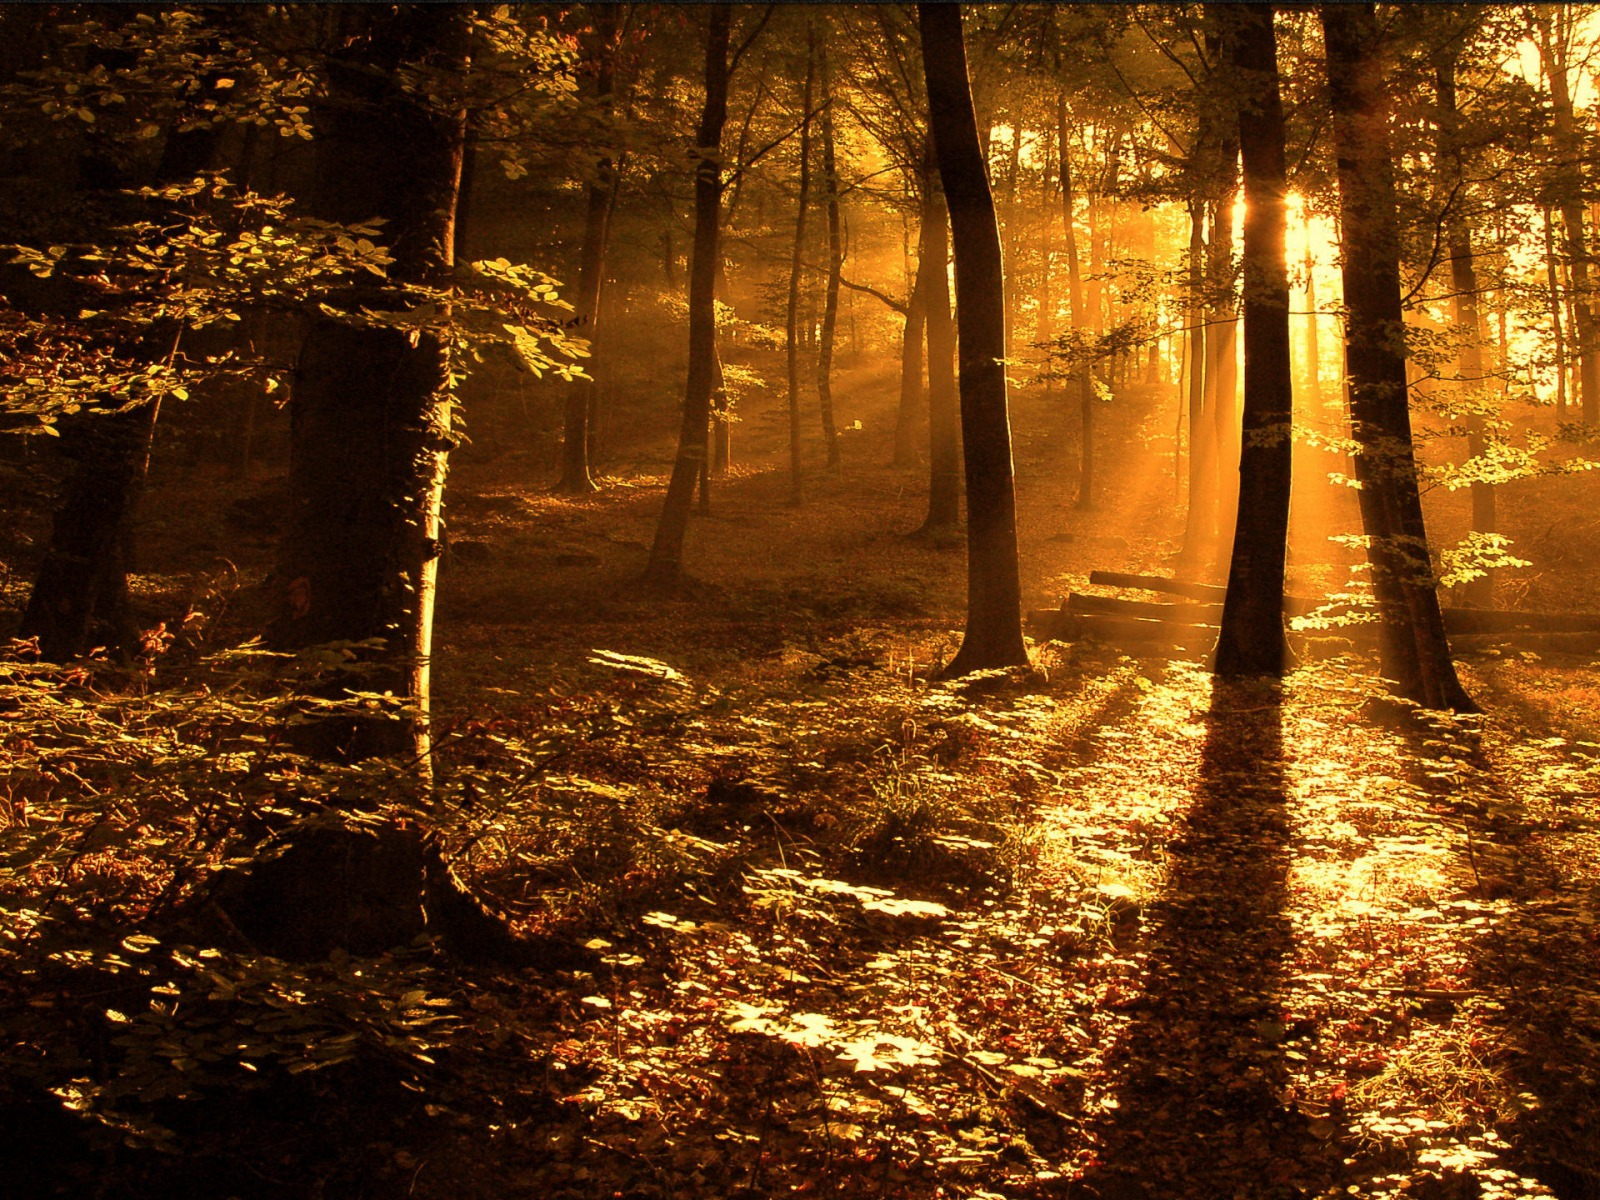 Fond d'ecran Dans les bois - Wallpaper